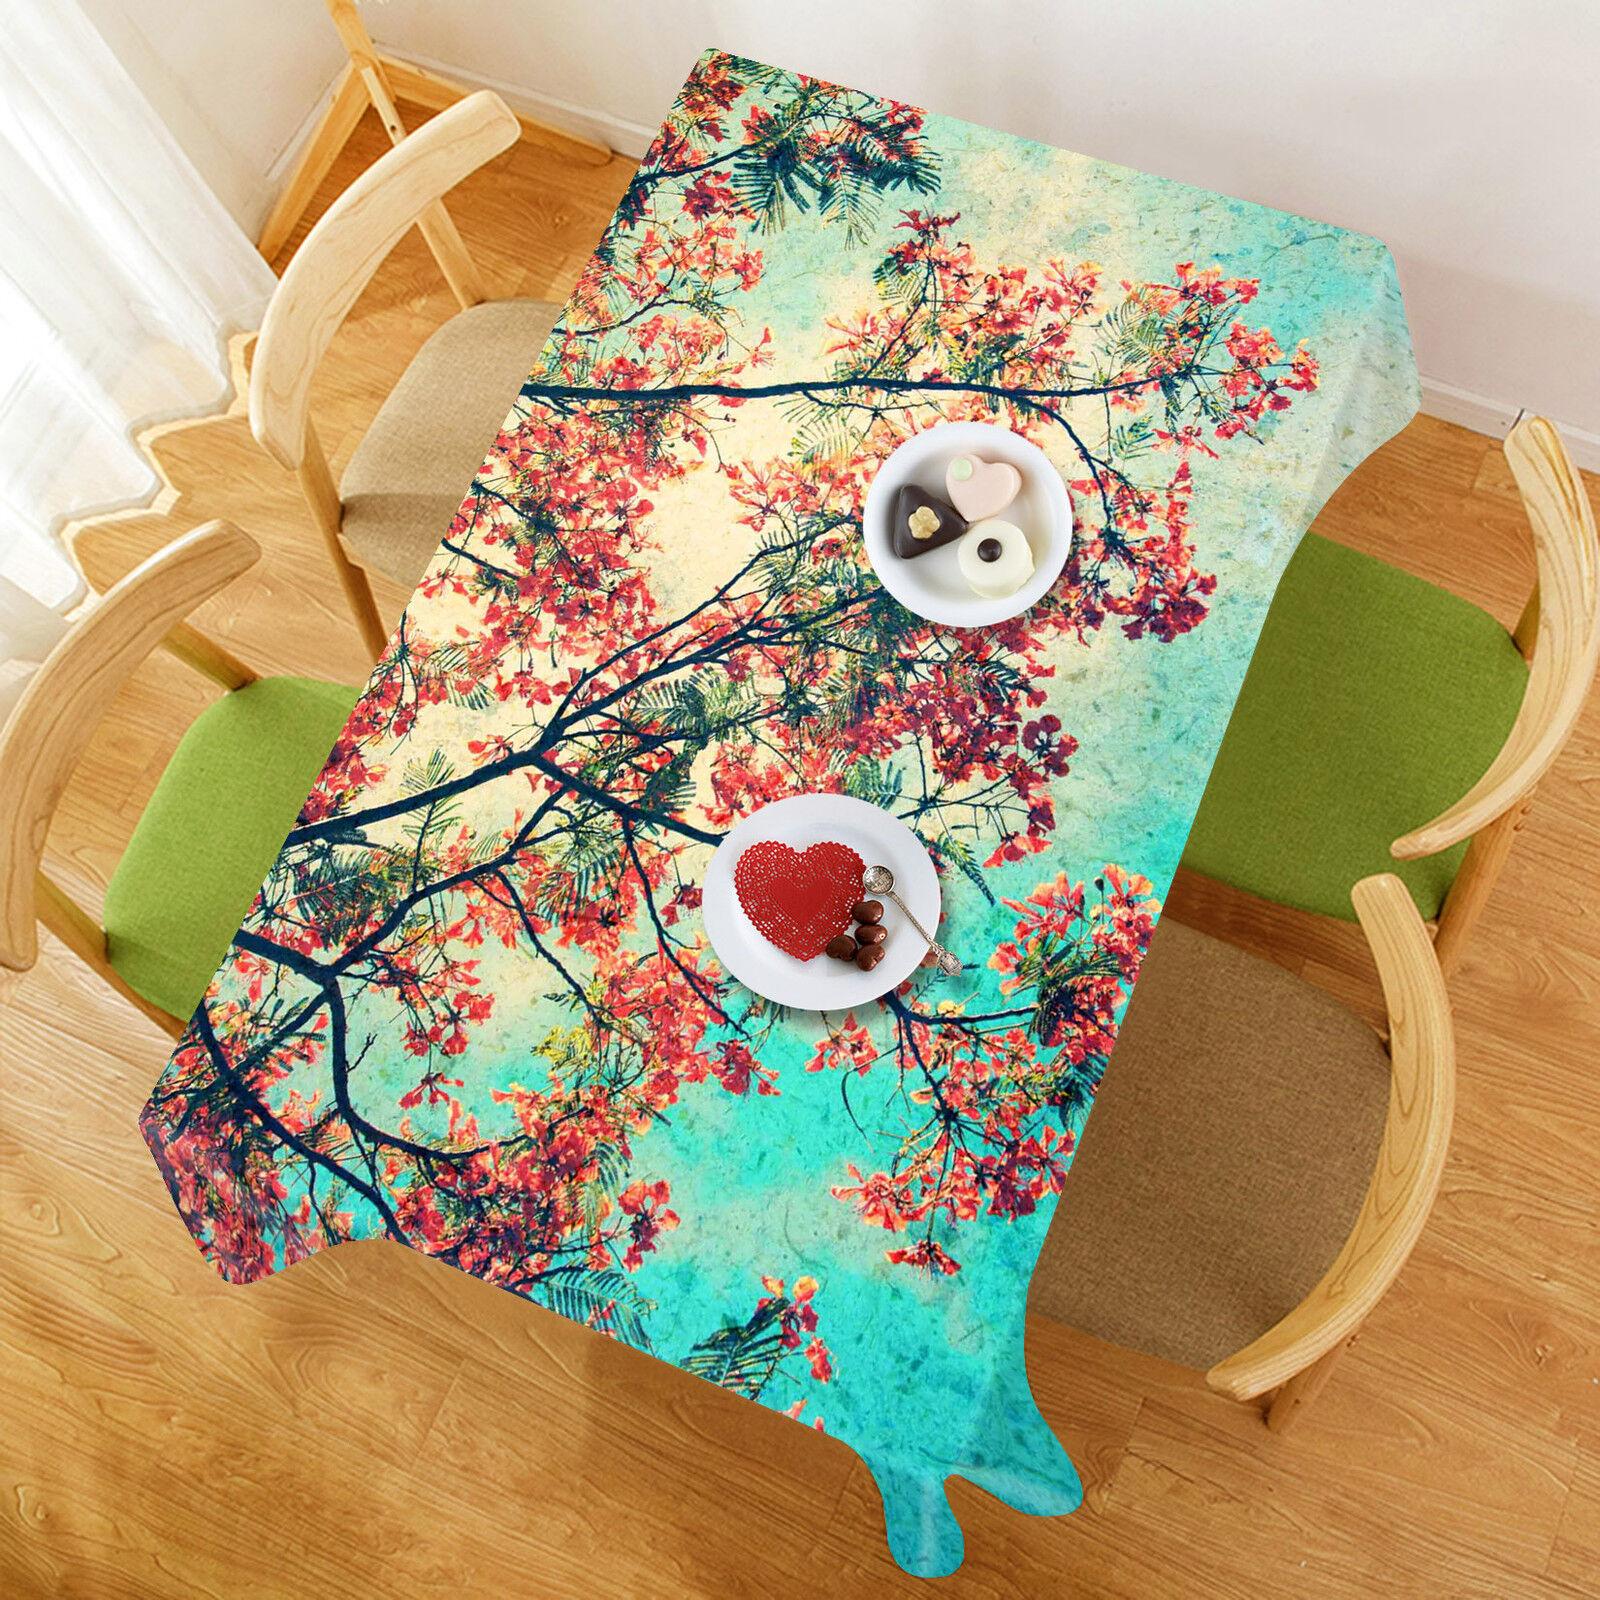 Flores 3d 459 mantel mantel pañuelo fiesta de cumpleaños AJ wallpaper de Lemon